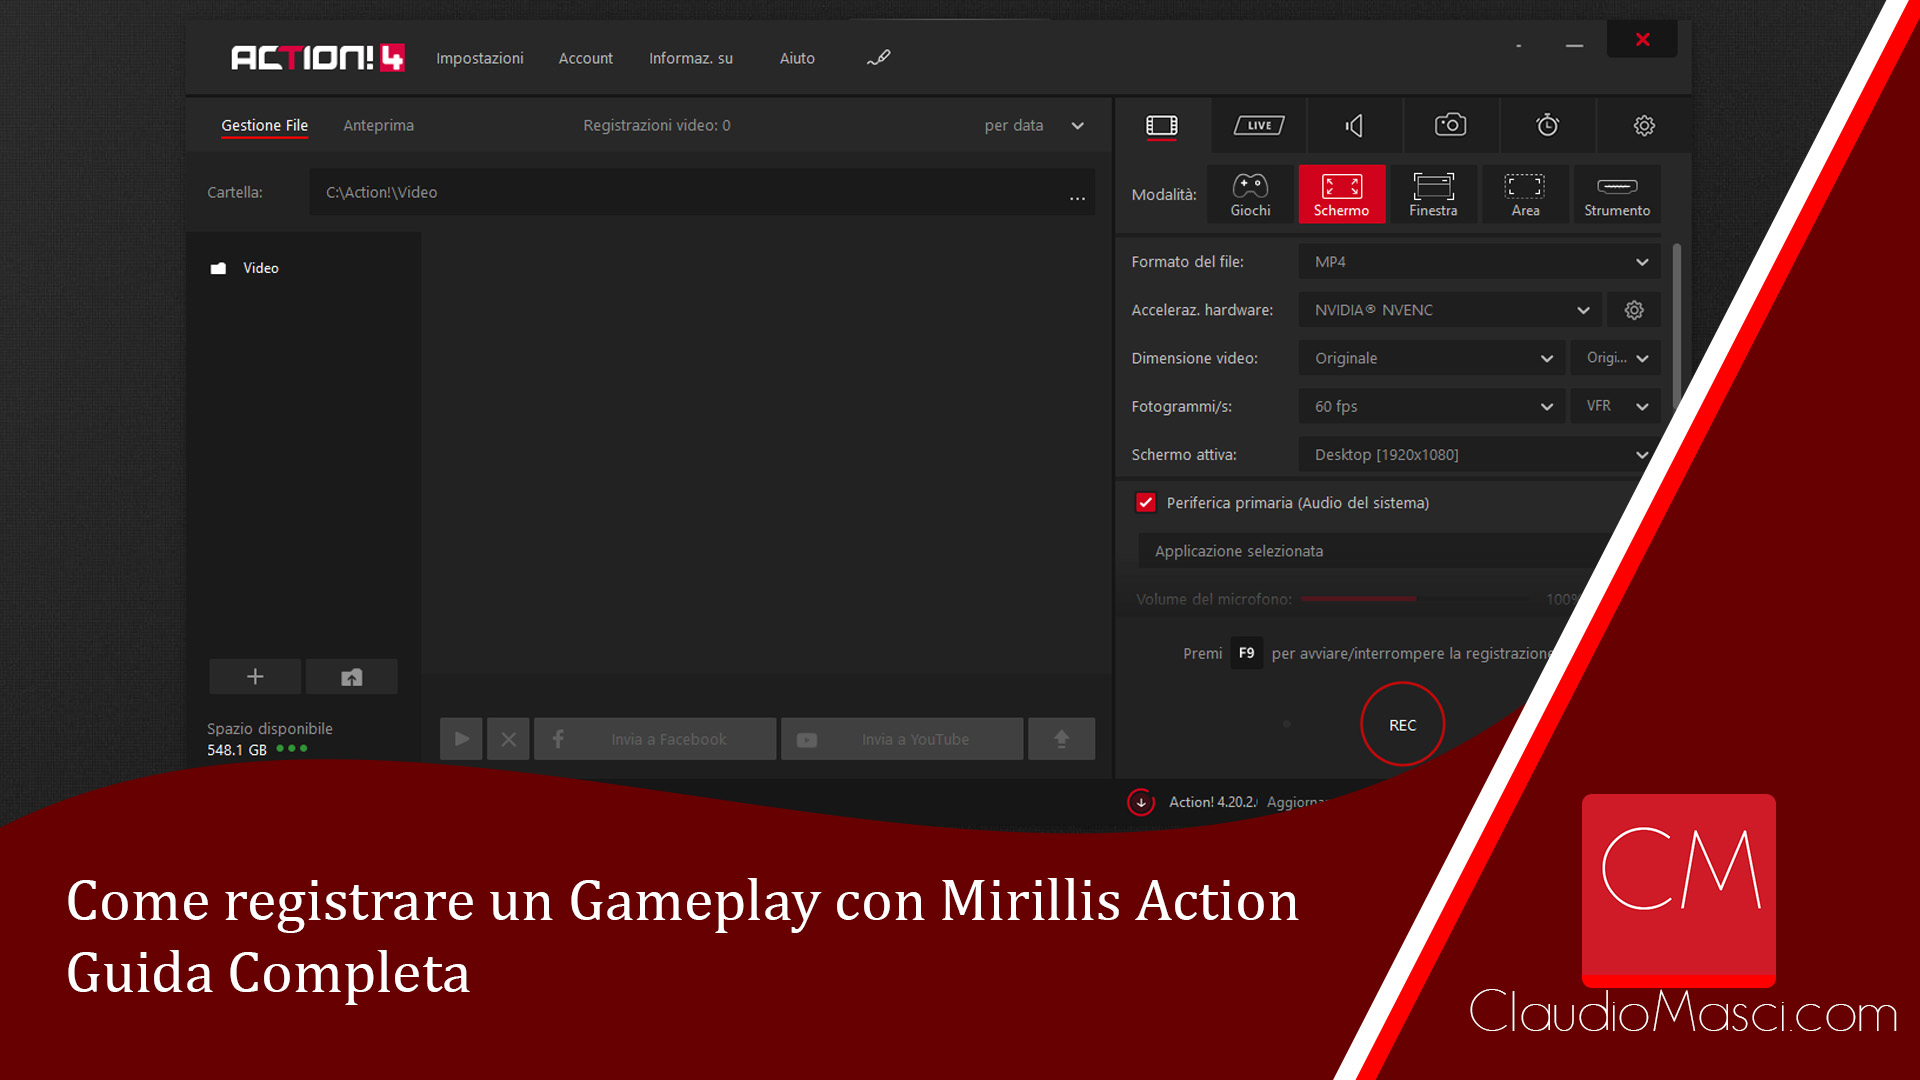 Come registrare un Gameplay con Mirillis Action – Guida Completa